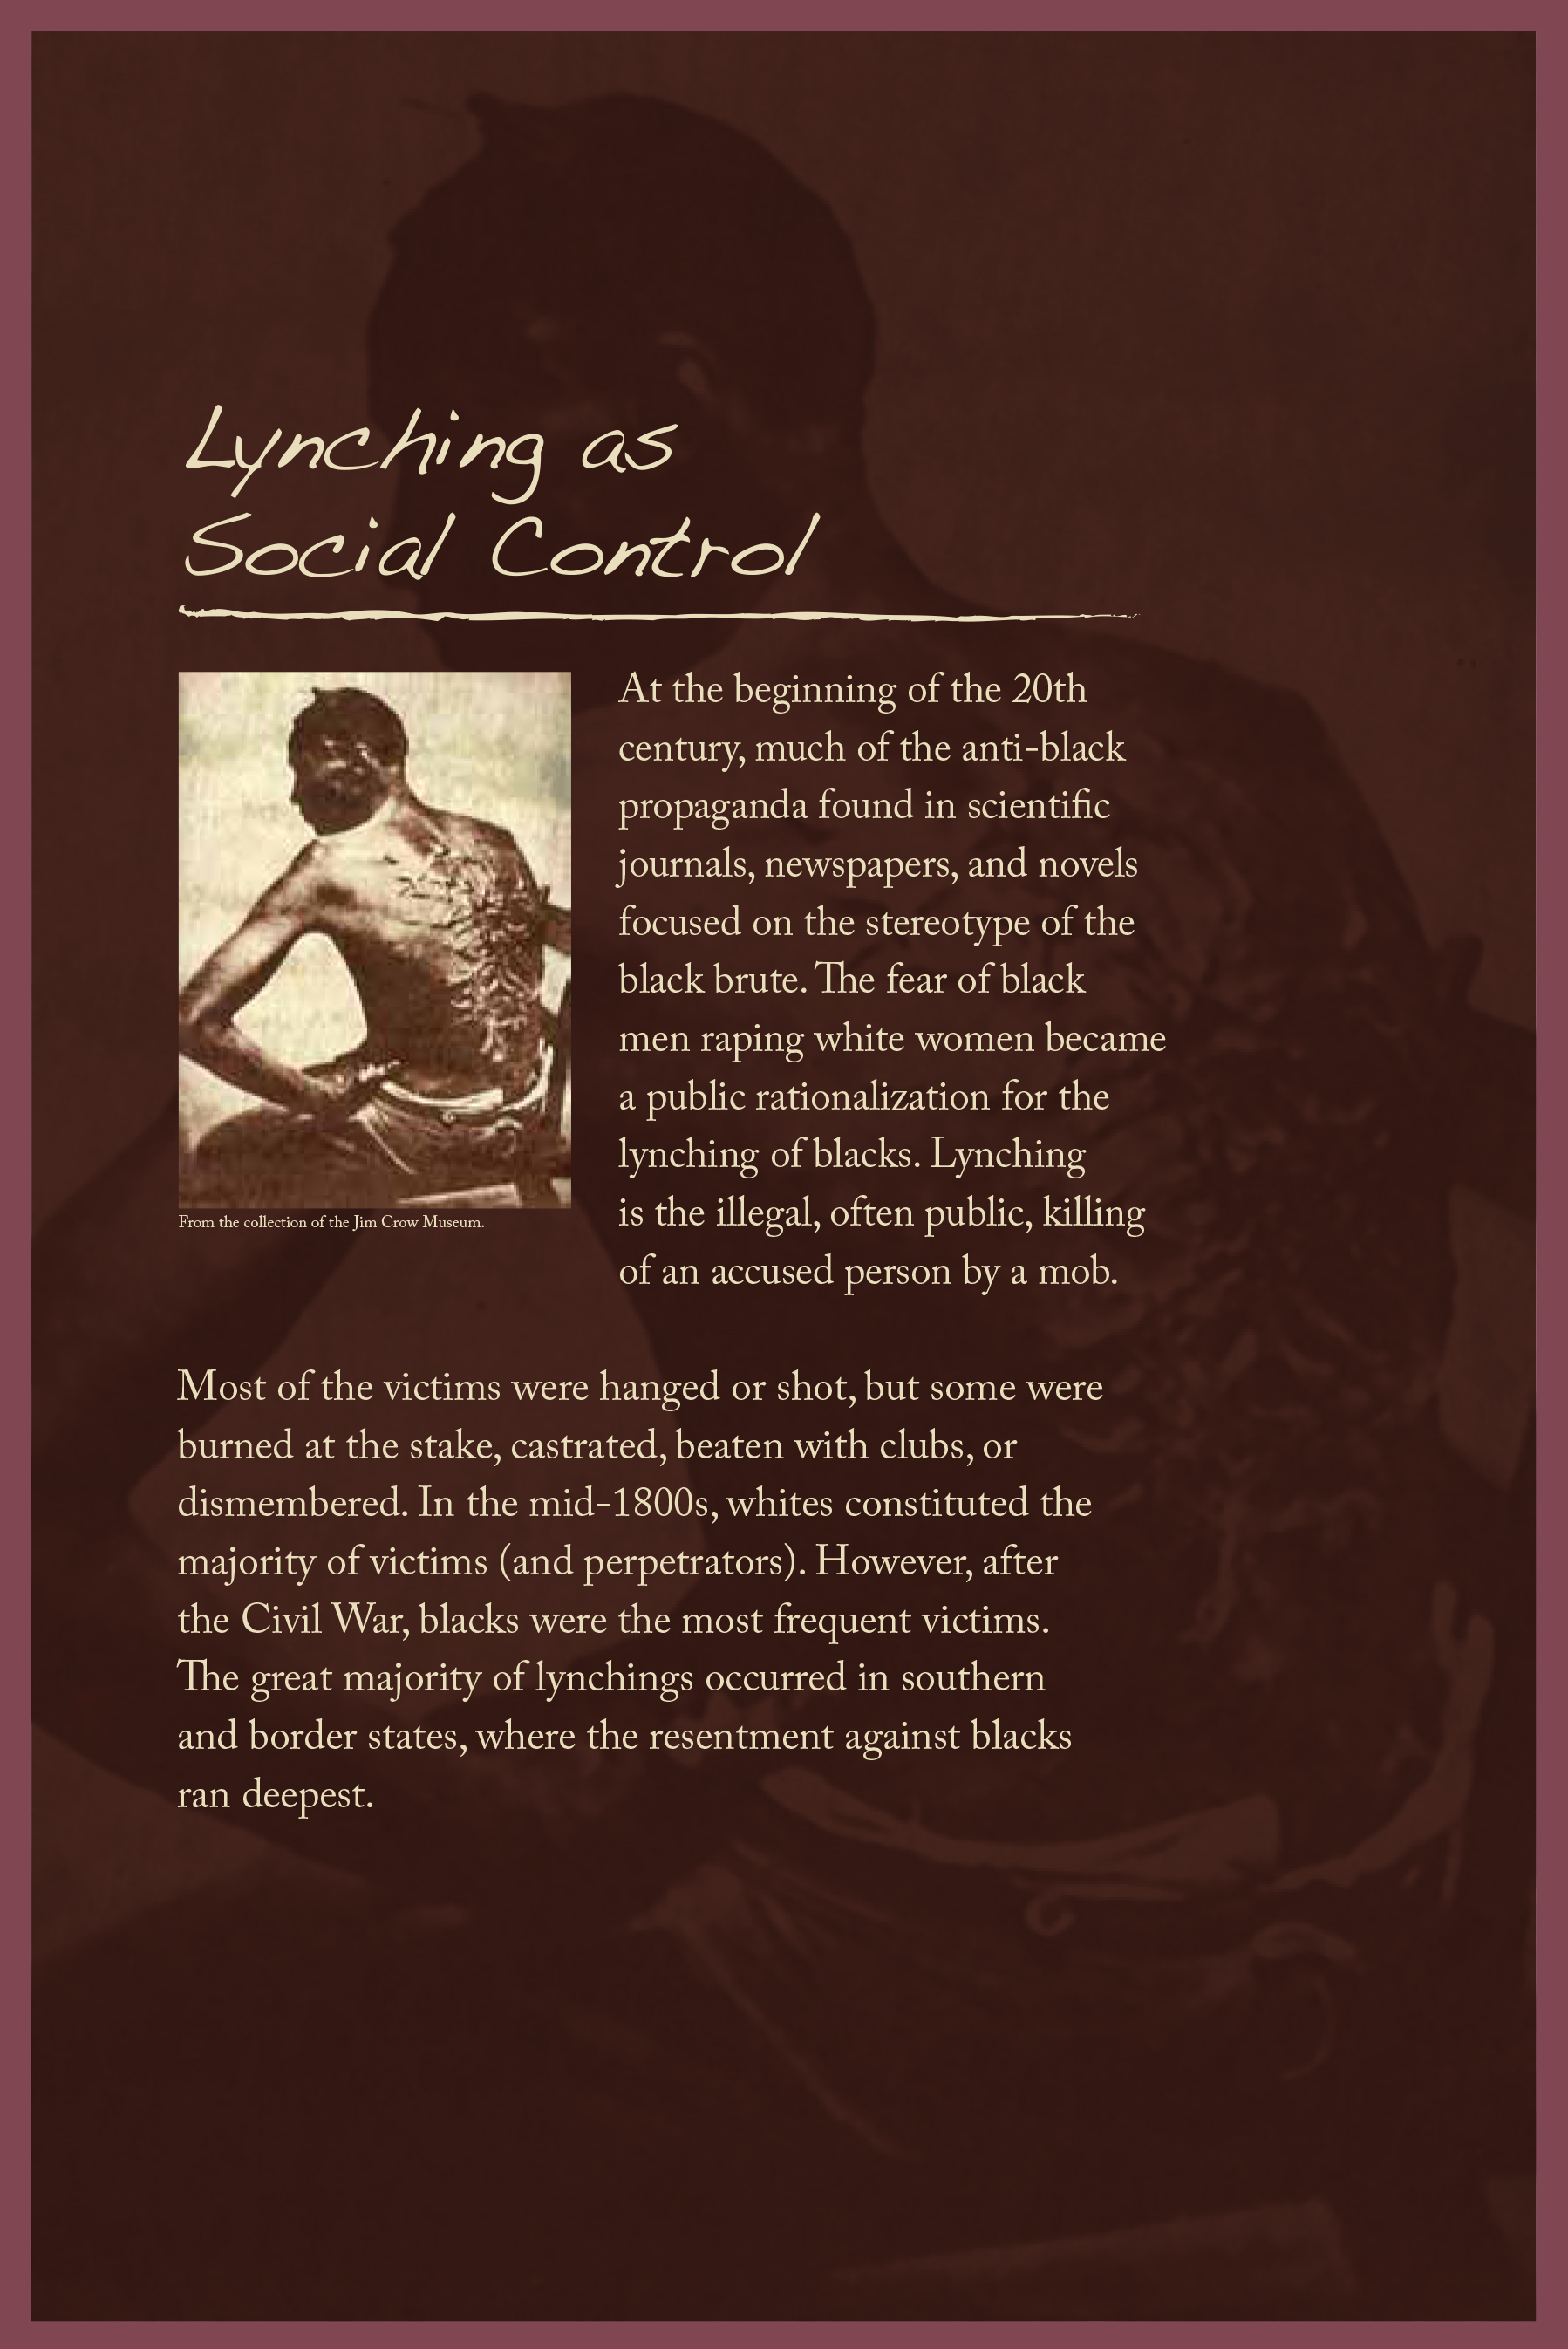 lyncing As Social Control.jpg